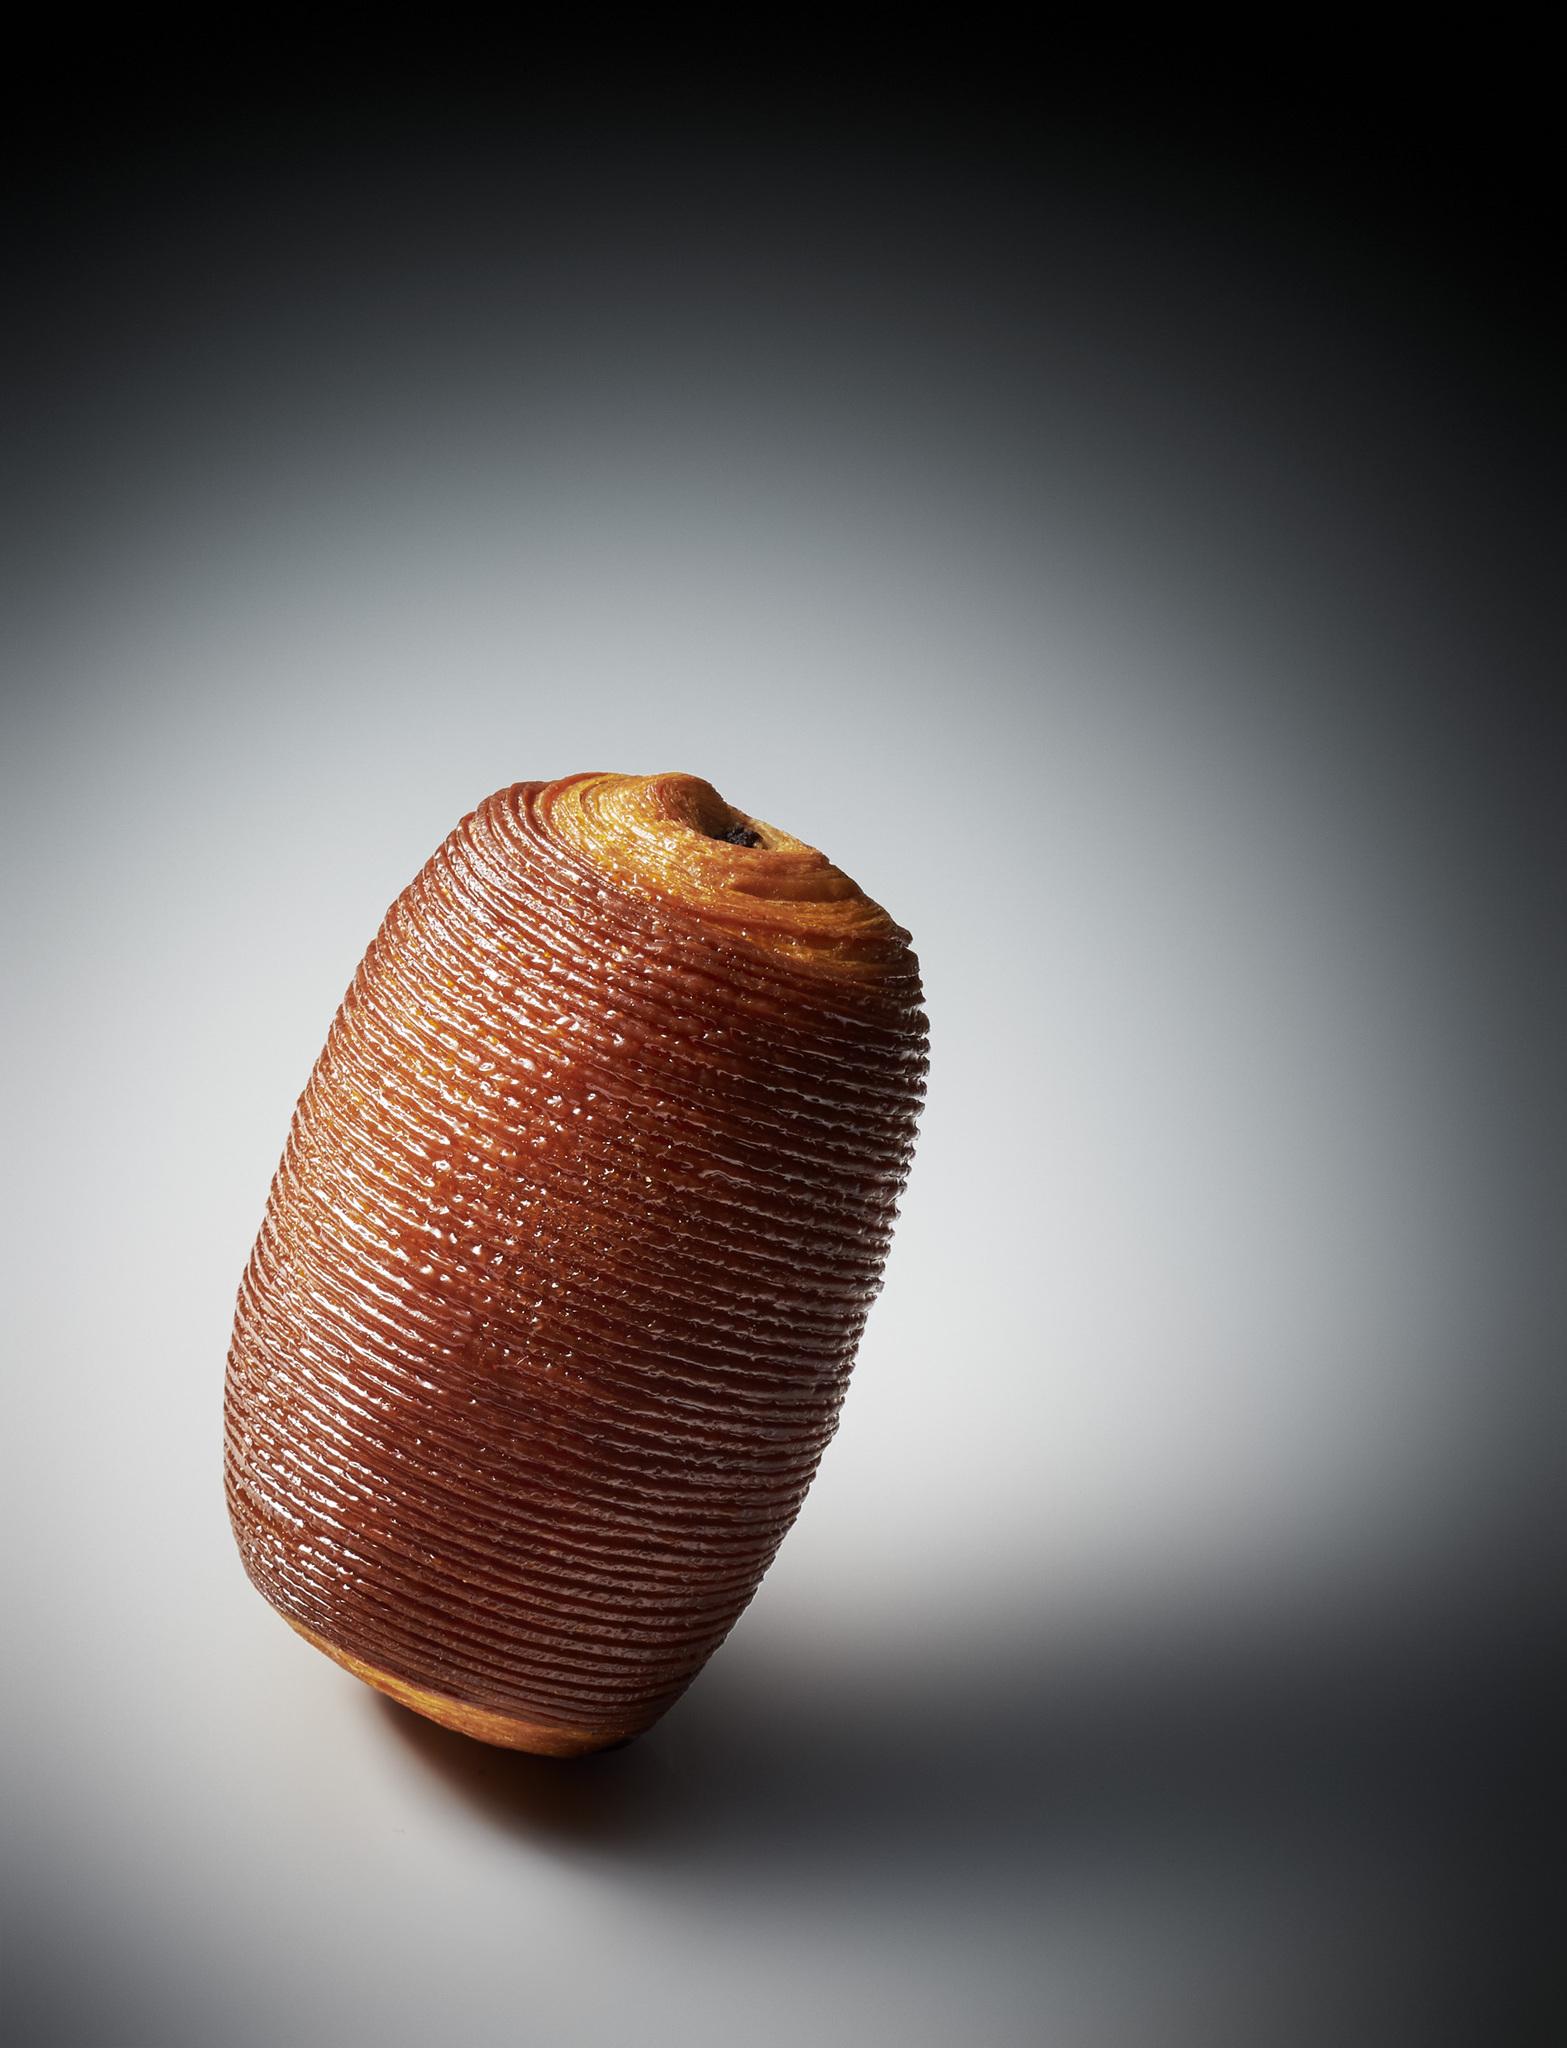 外型高貴現代的巧克力酥皮麵包。©Laurent Fau.